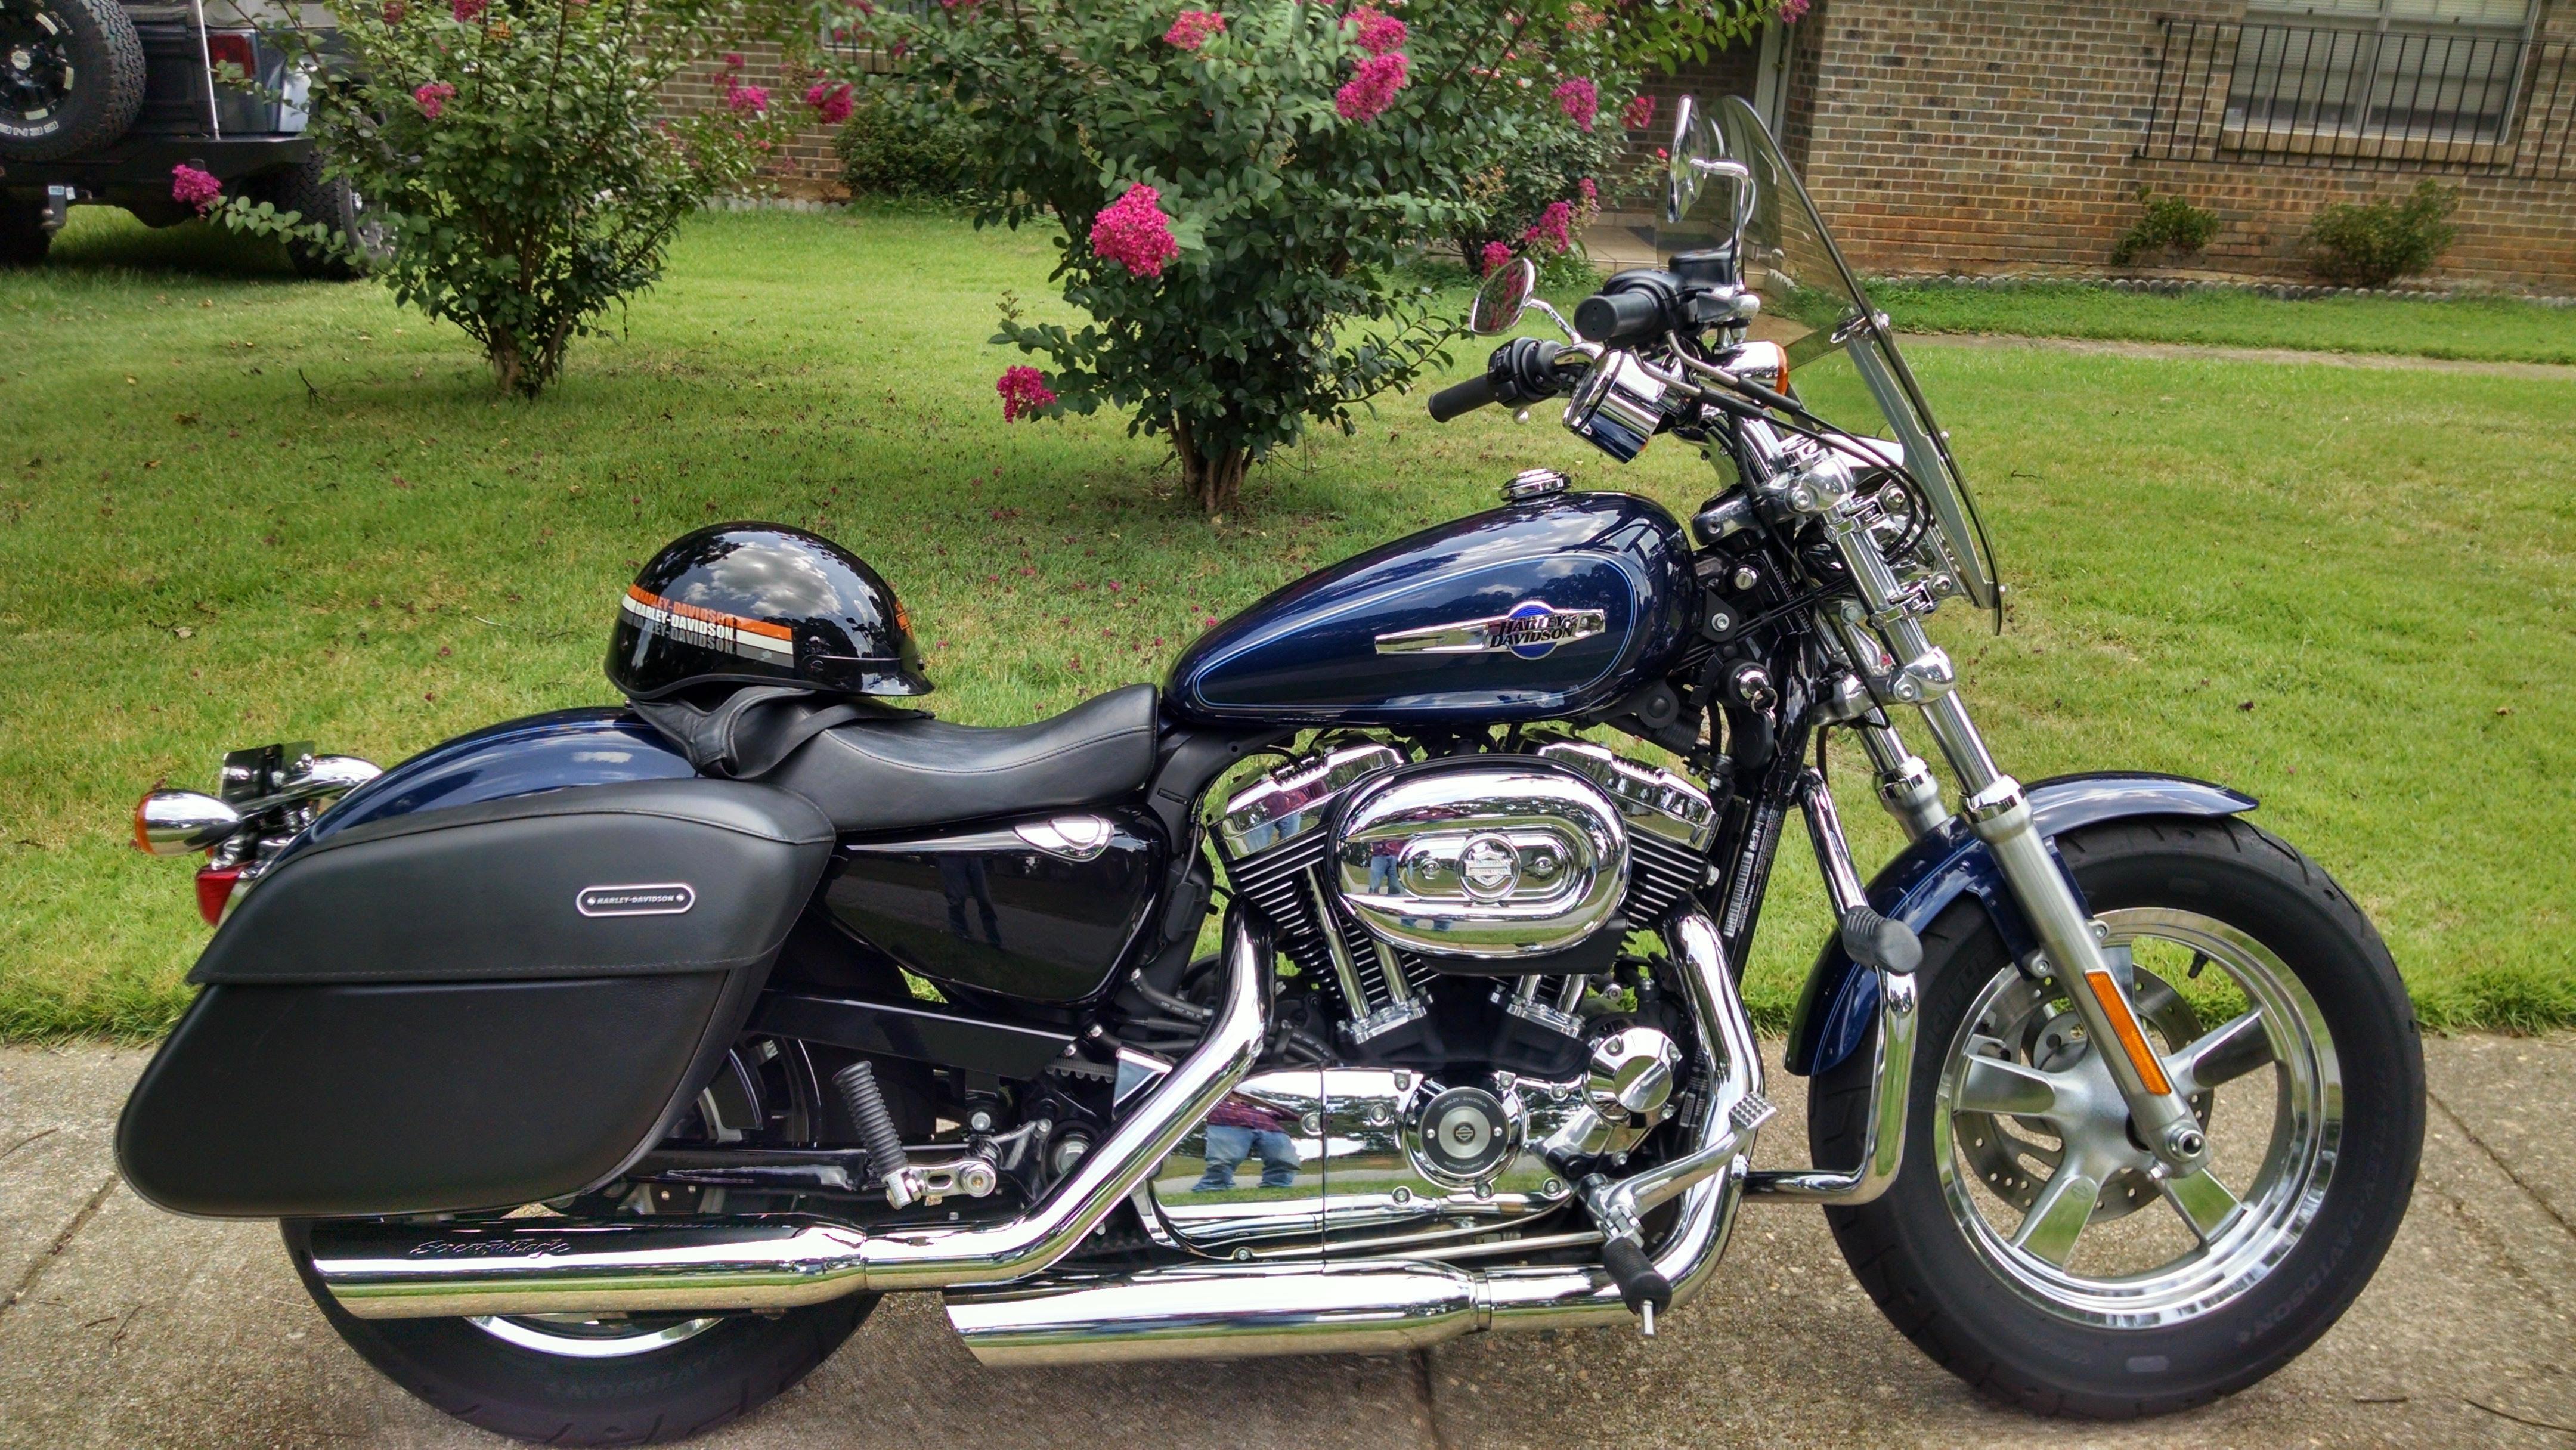 Photo 2013 Harley-Davidson SPORTSTER 1200 SPORT $6995176.97176.97